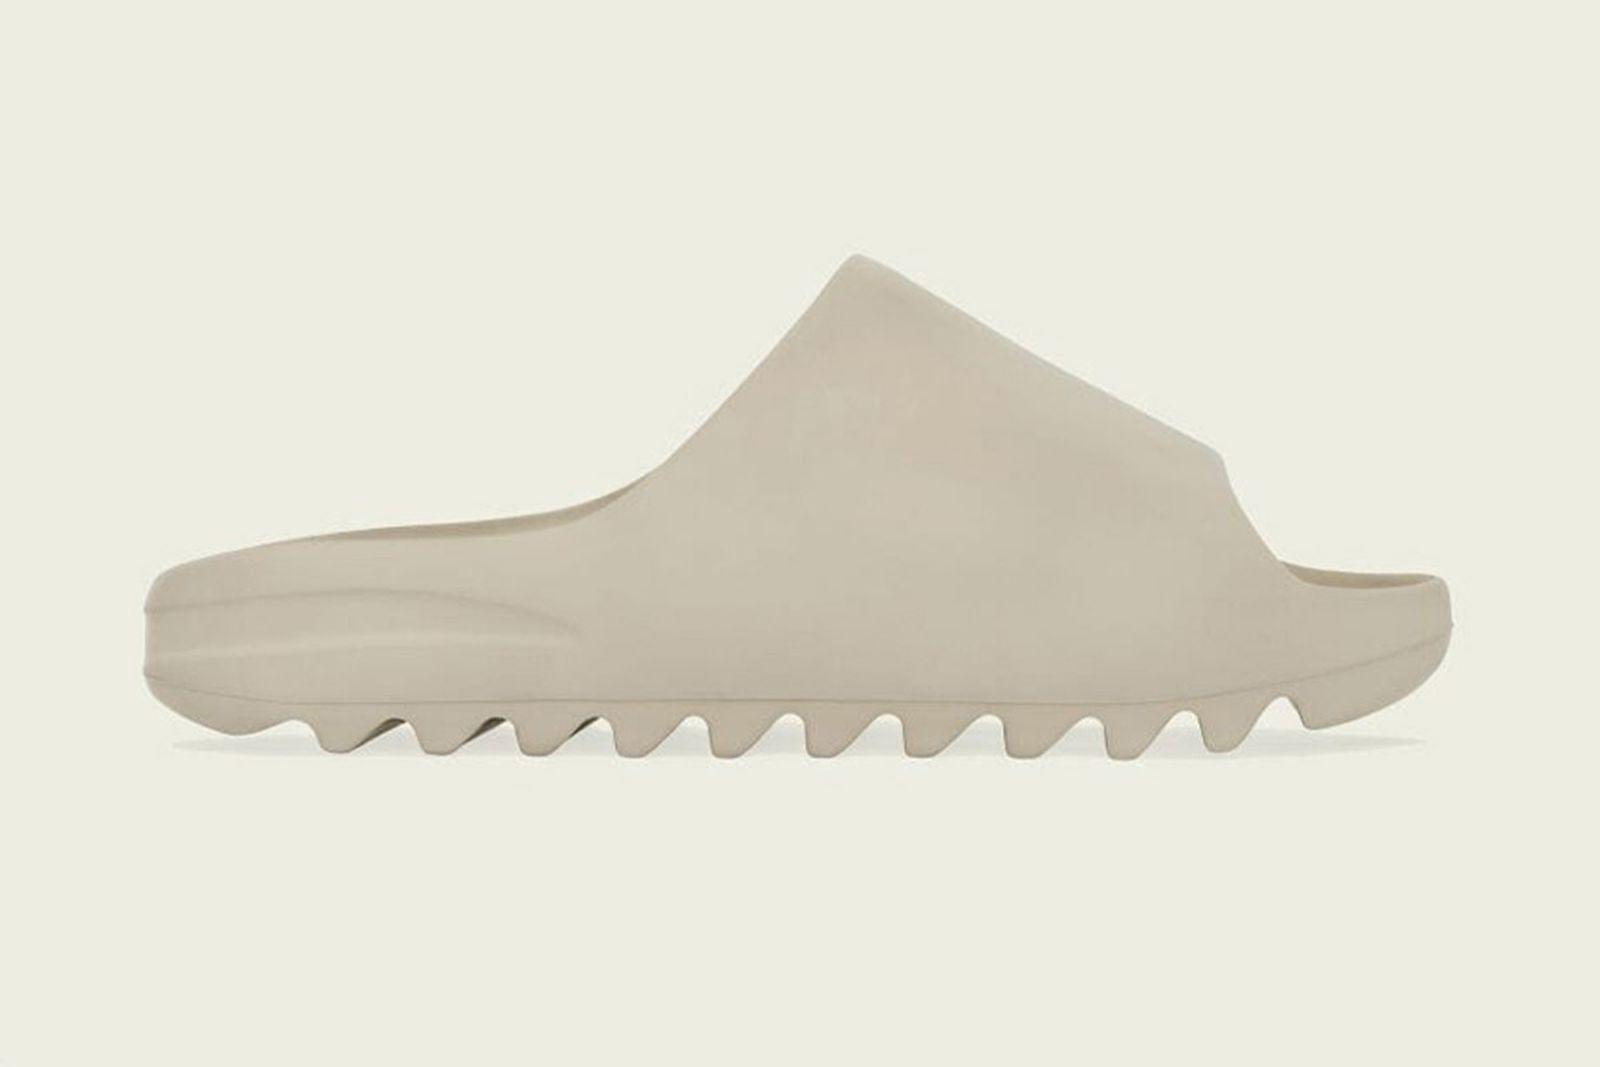 adidas-yeezy-september-release-info-date-price-04